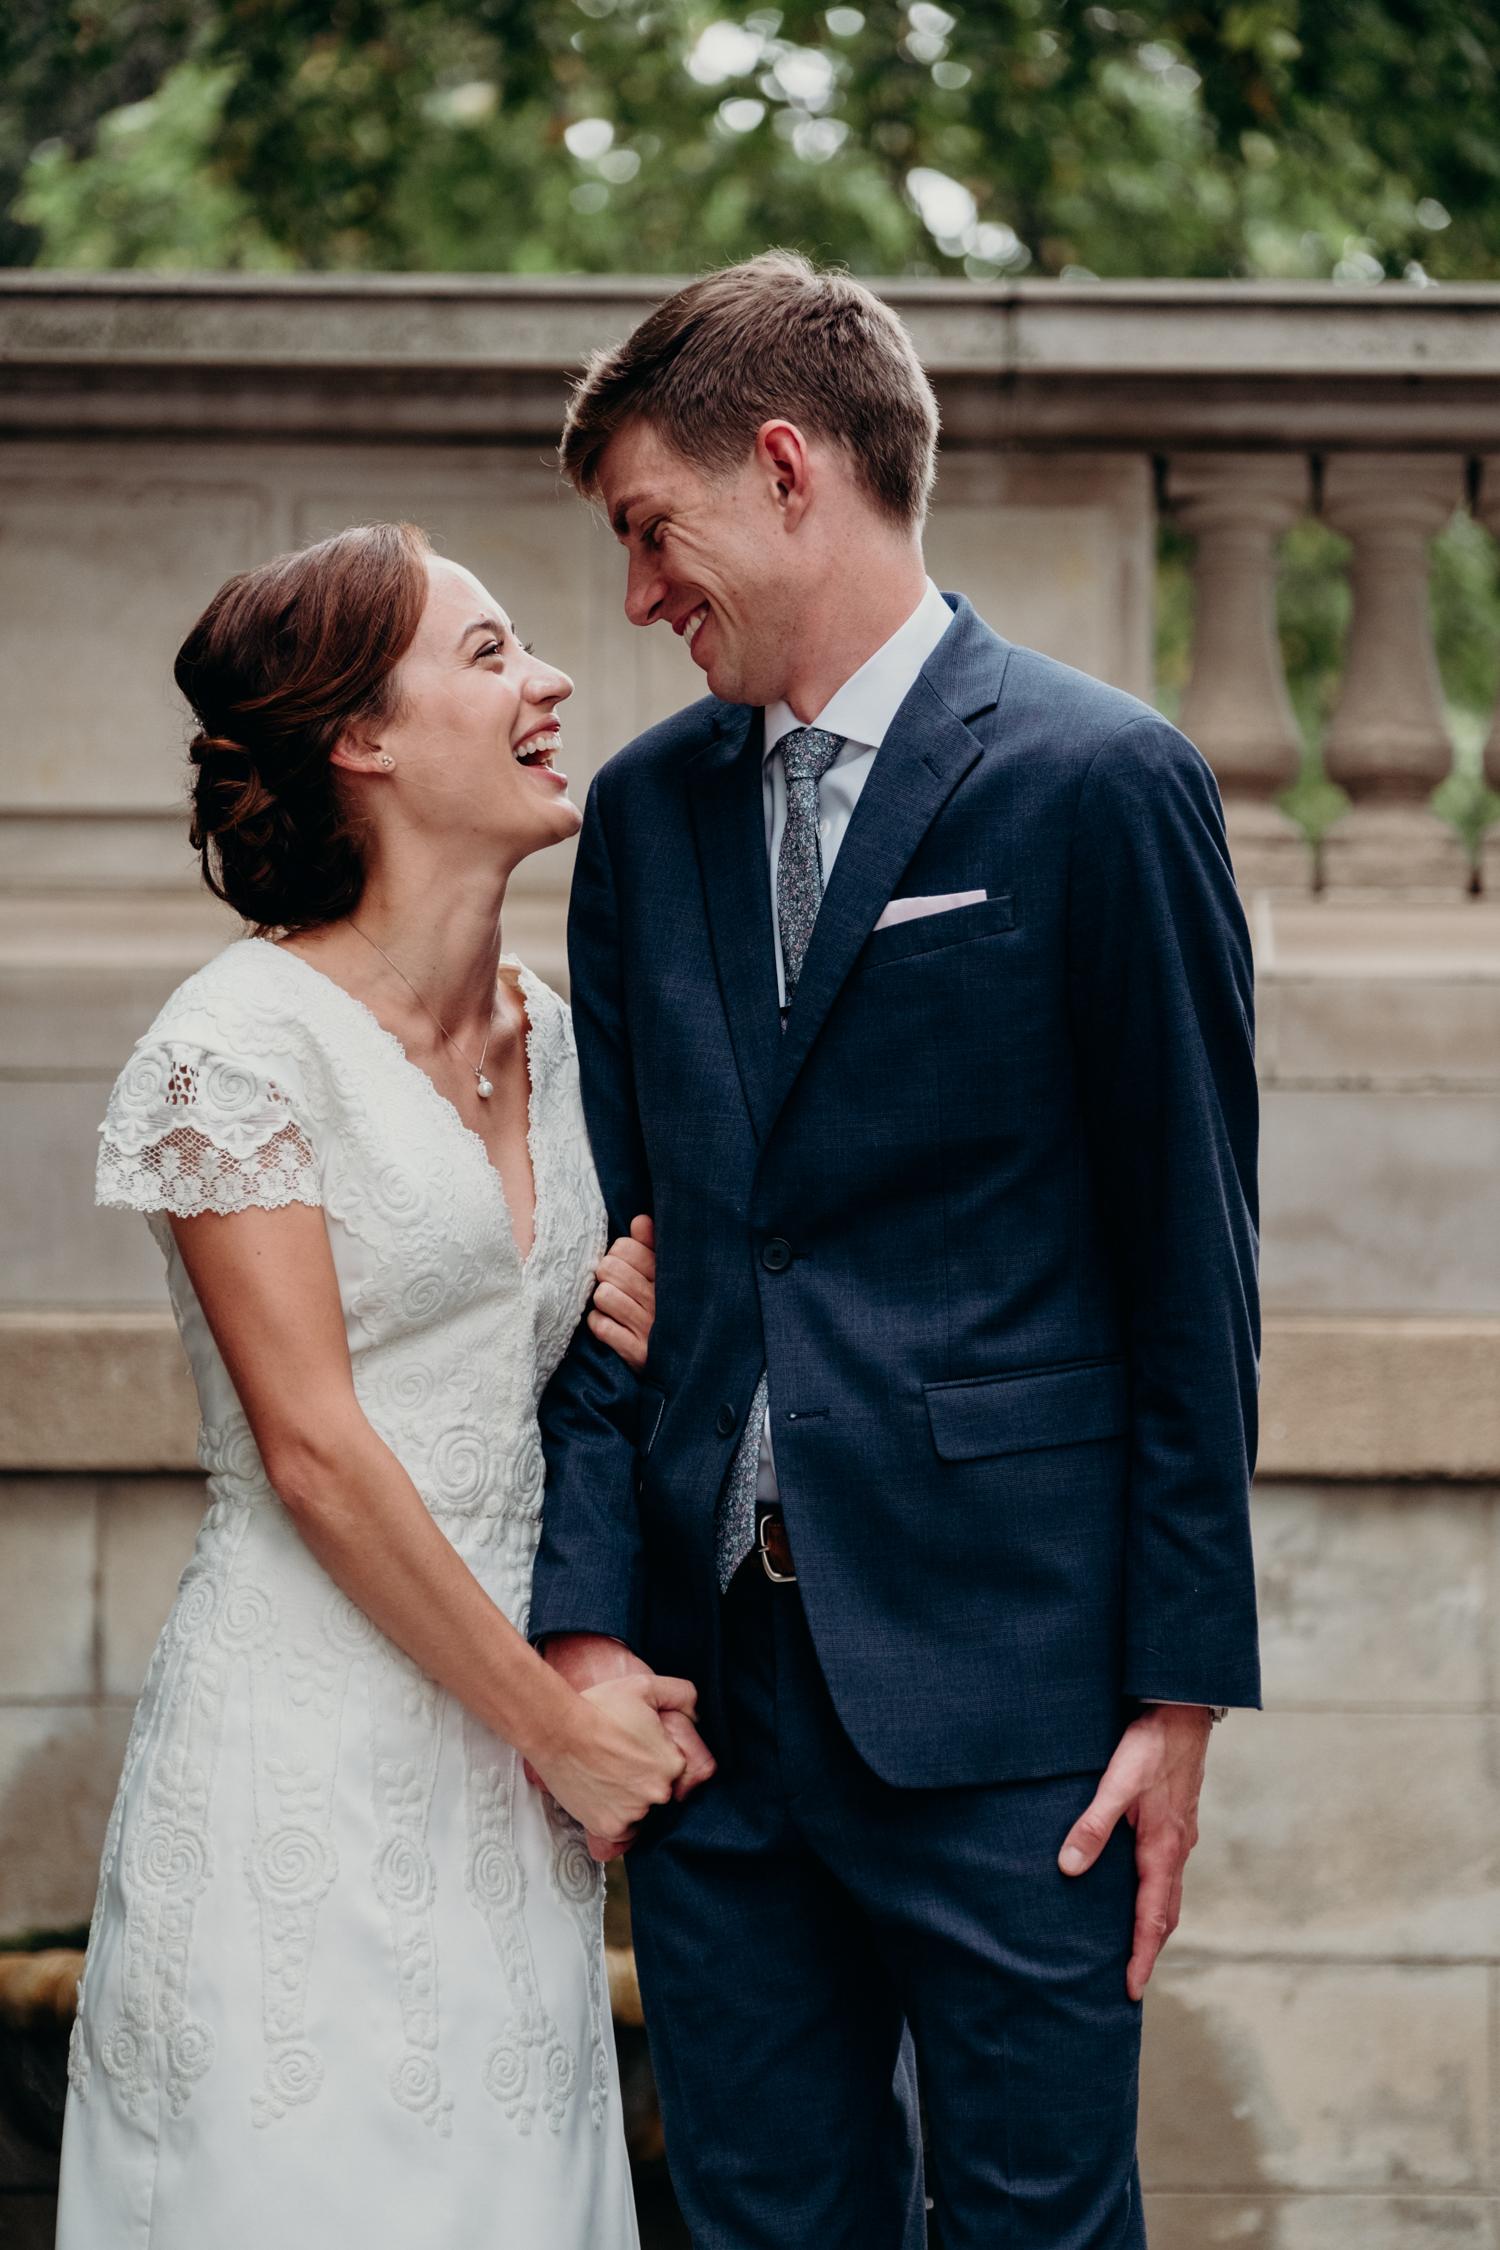 Spanish Steps wedding portraits